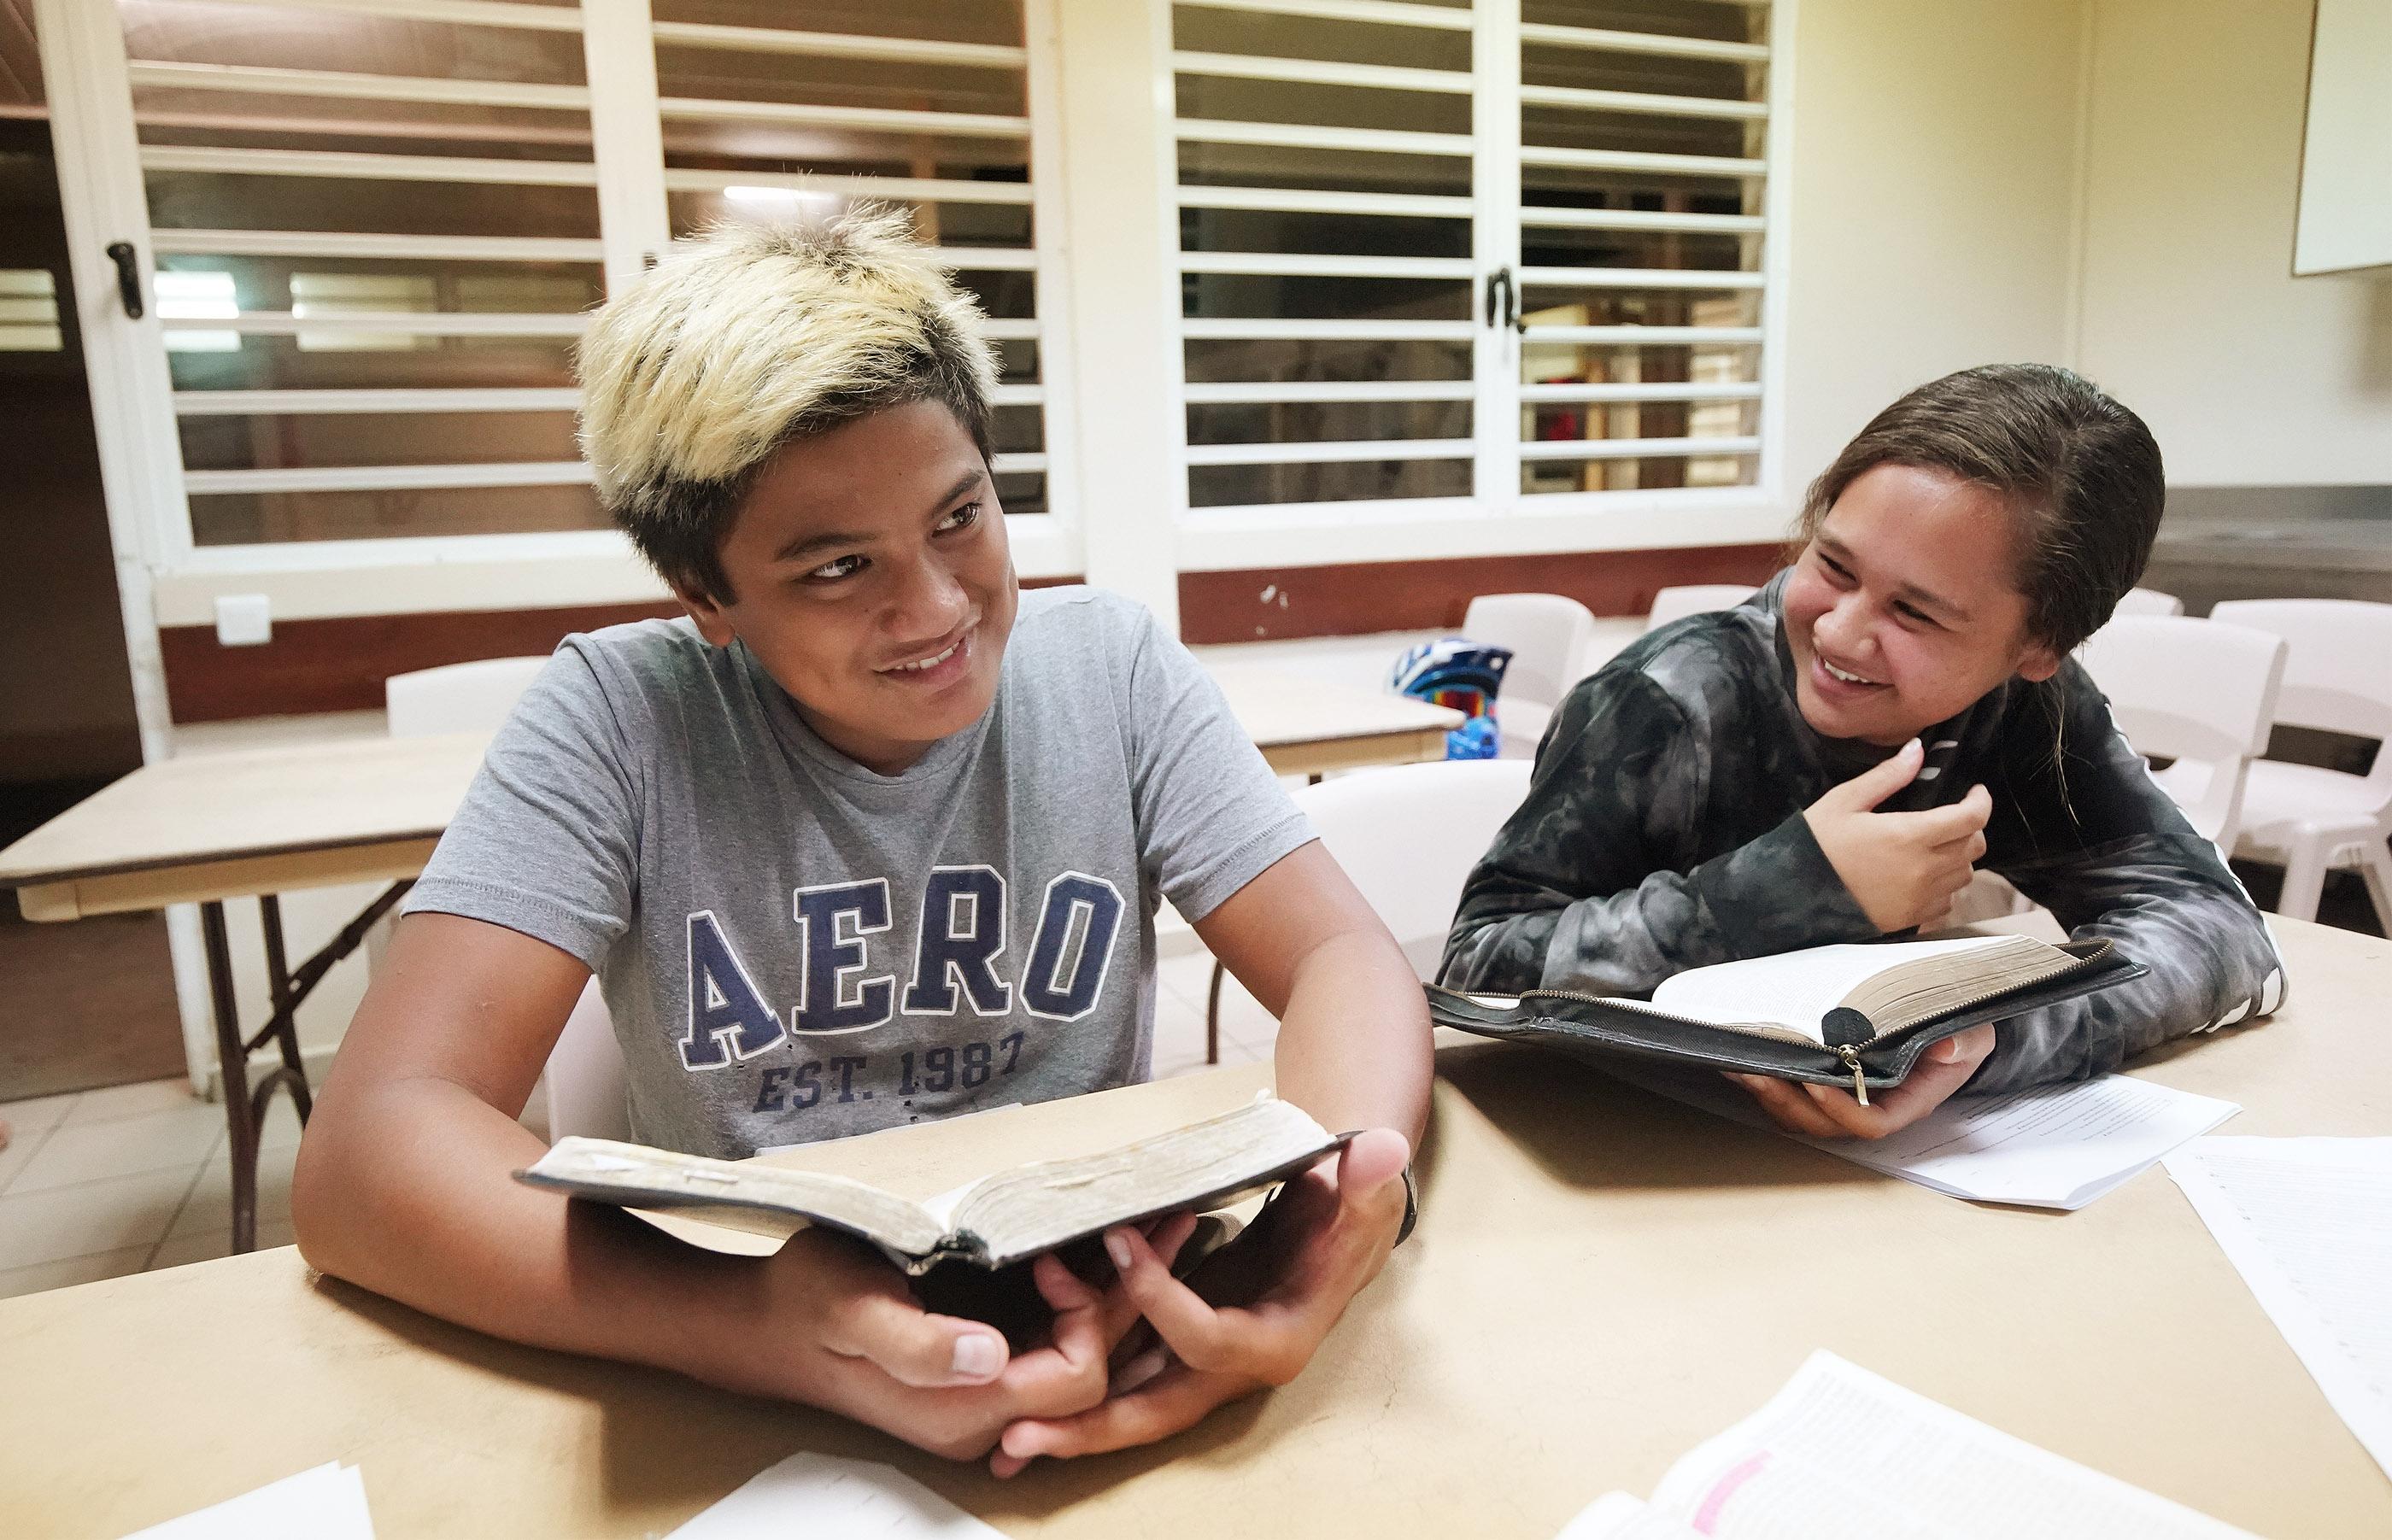 Teharuru Teriipaia and Heraiti Ariiveheata read scriptures during Latter-day Saint seminary in Bora Bora on May 28, 2019.